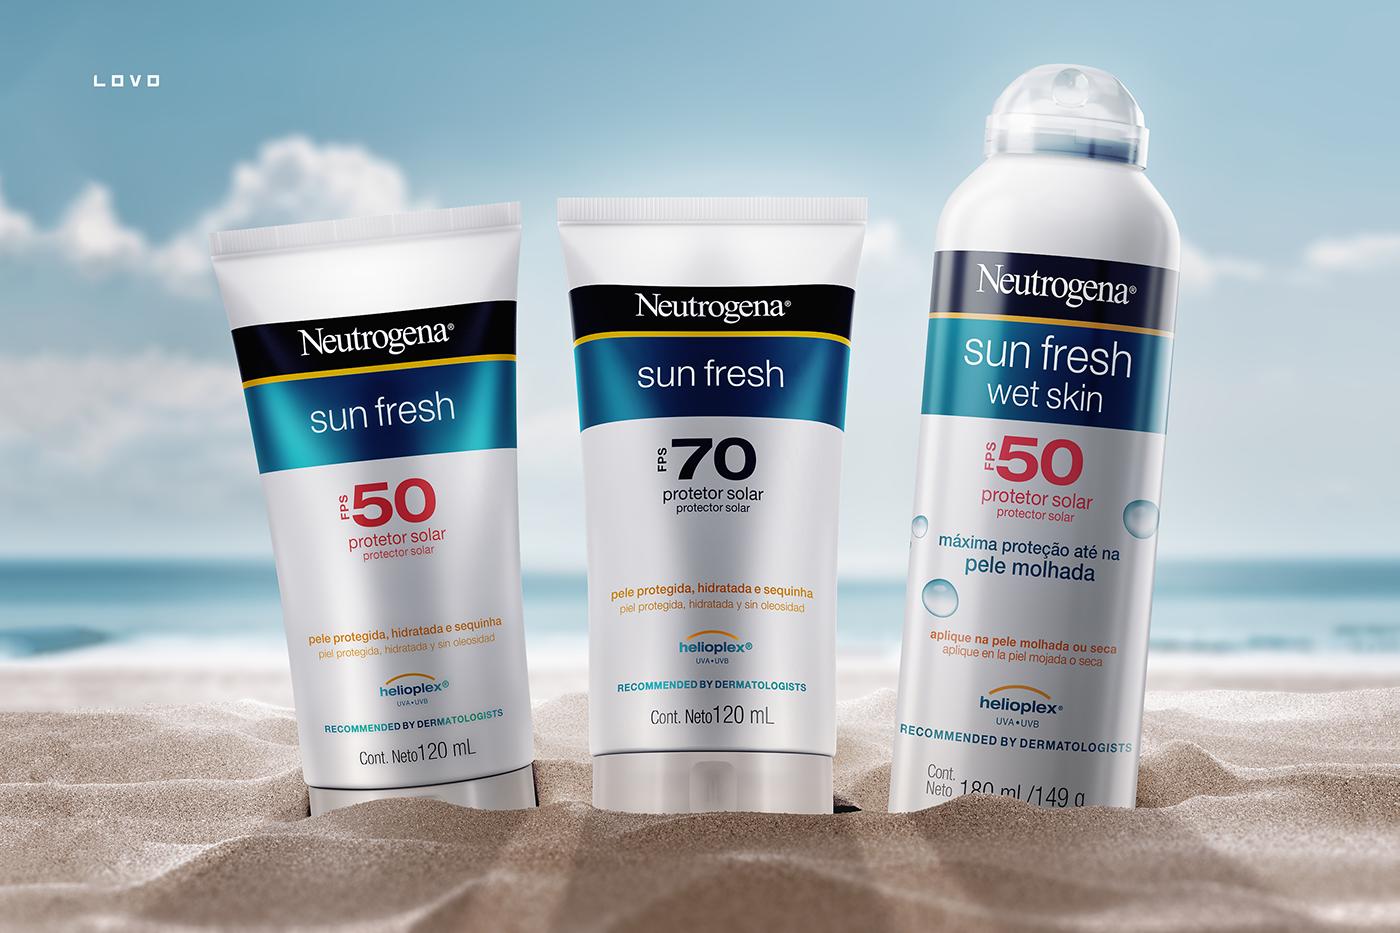 Sun Fresh Neutrogena Sun can beauty lovo Render CG sand beach